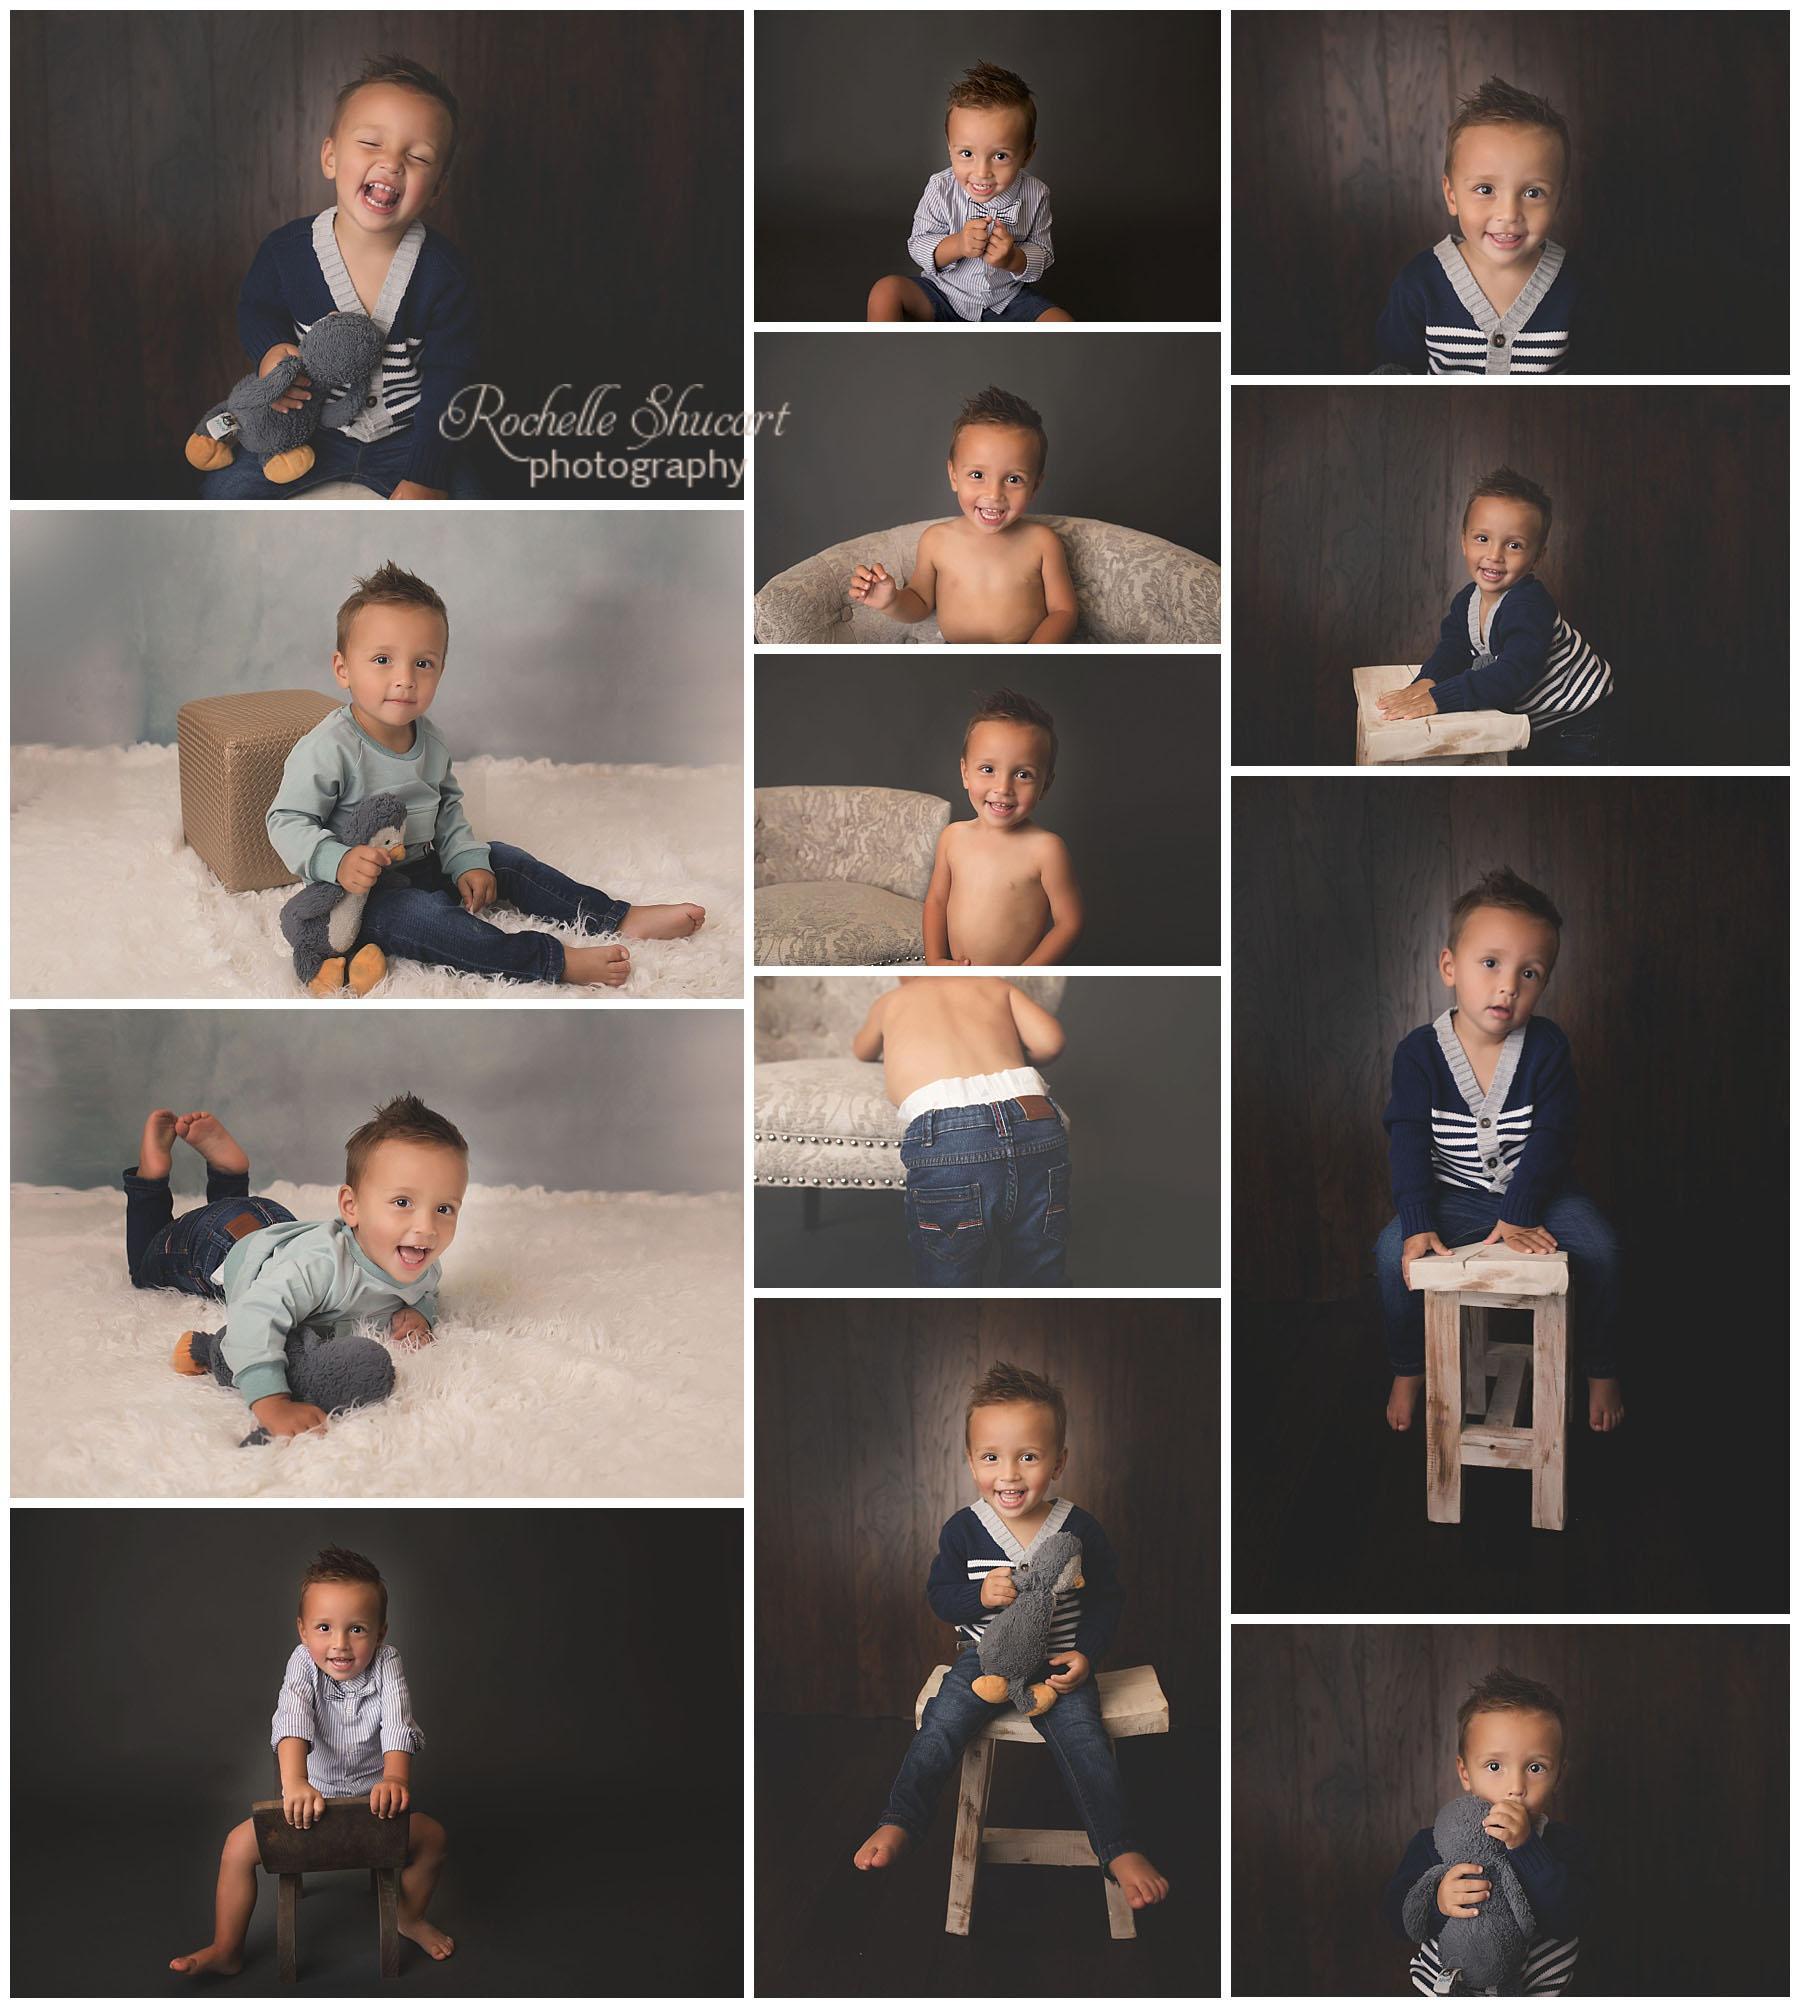 Naples Fl Baby And Children Photographer 187 Rochelle